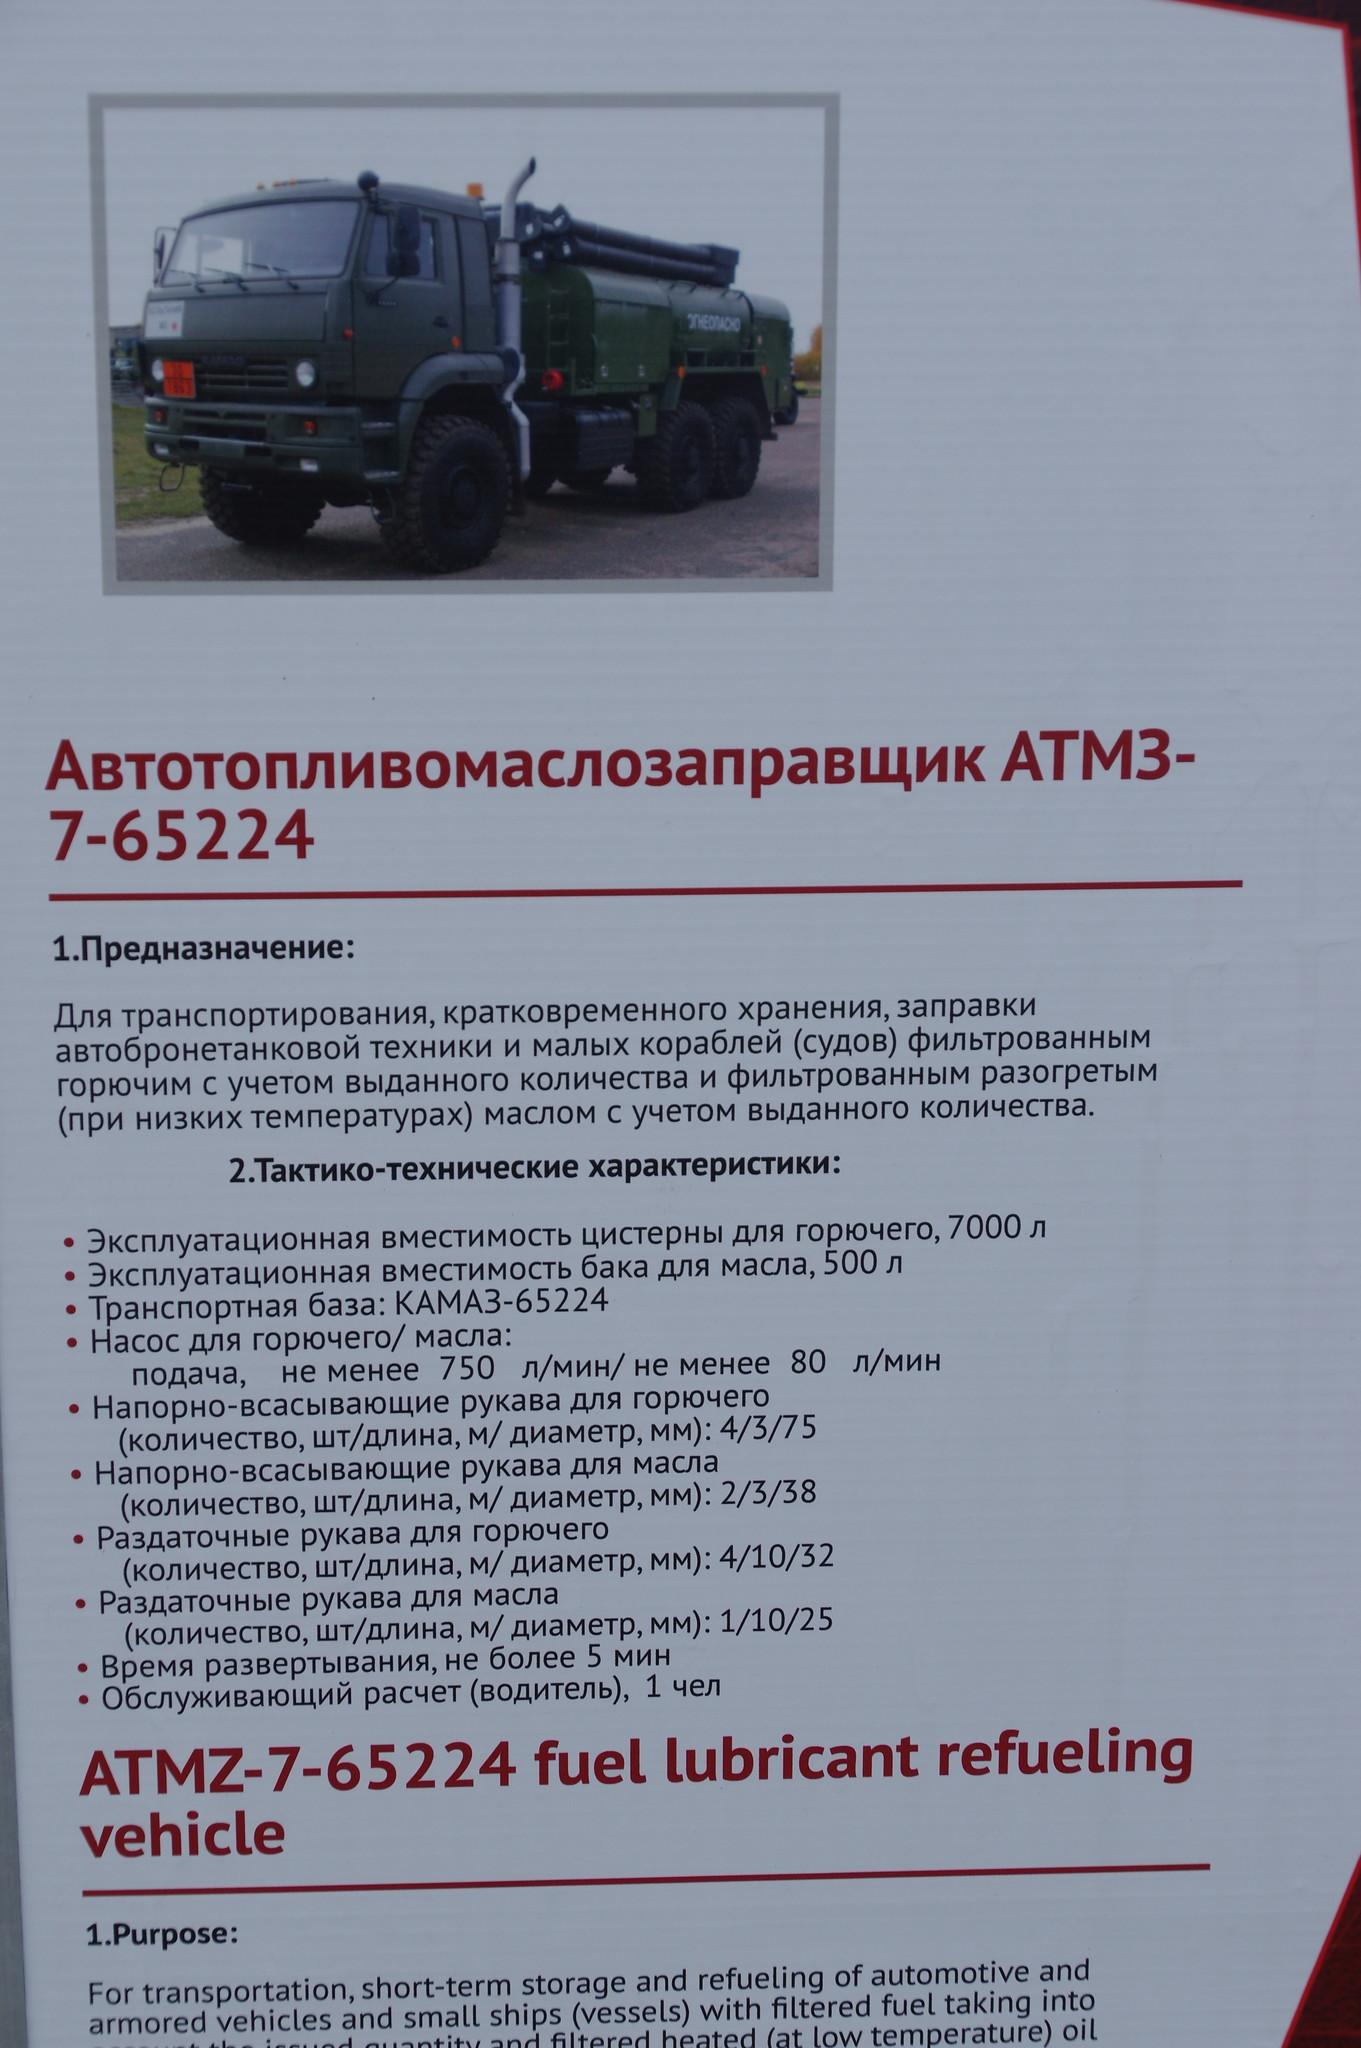 Автотопливомаслозаправщик АТМЗ-7-65224